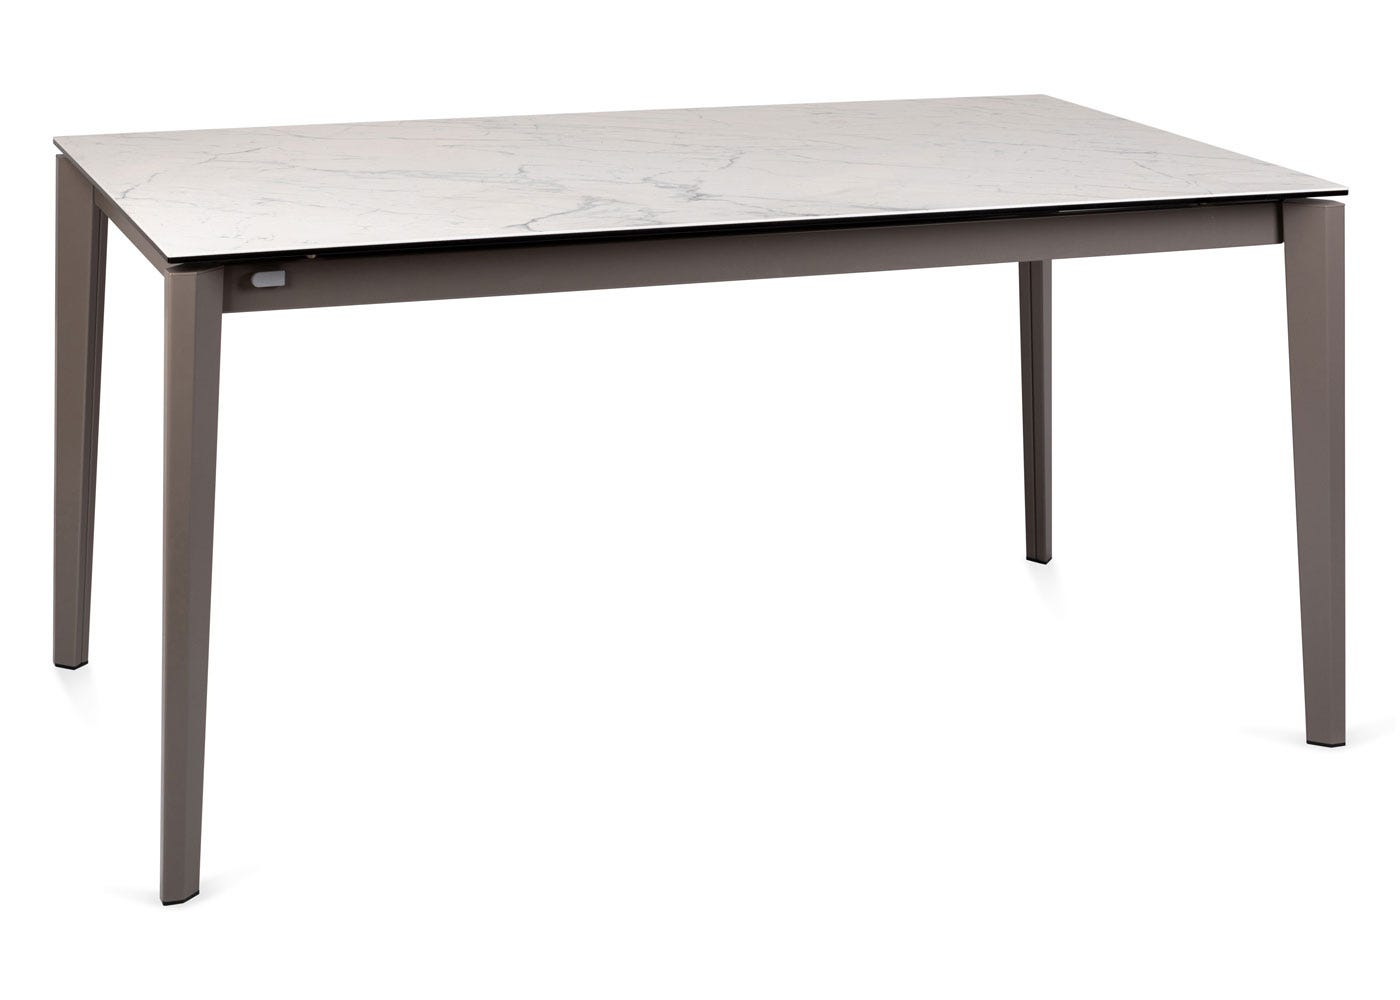 Heal's Rocca Ceramic Extending Dining Table Carrara White Ceramic Top Top